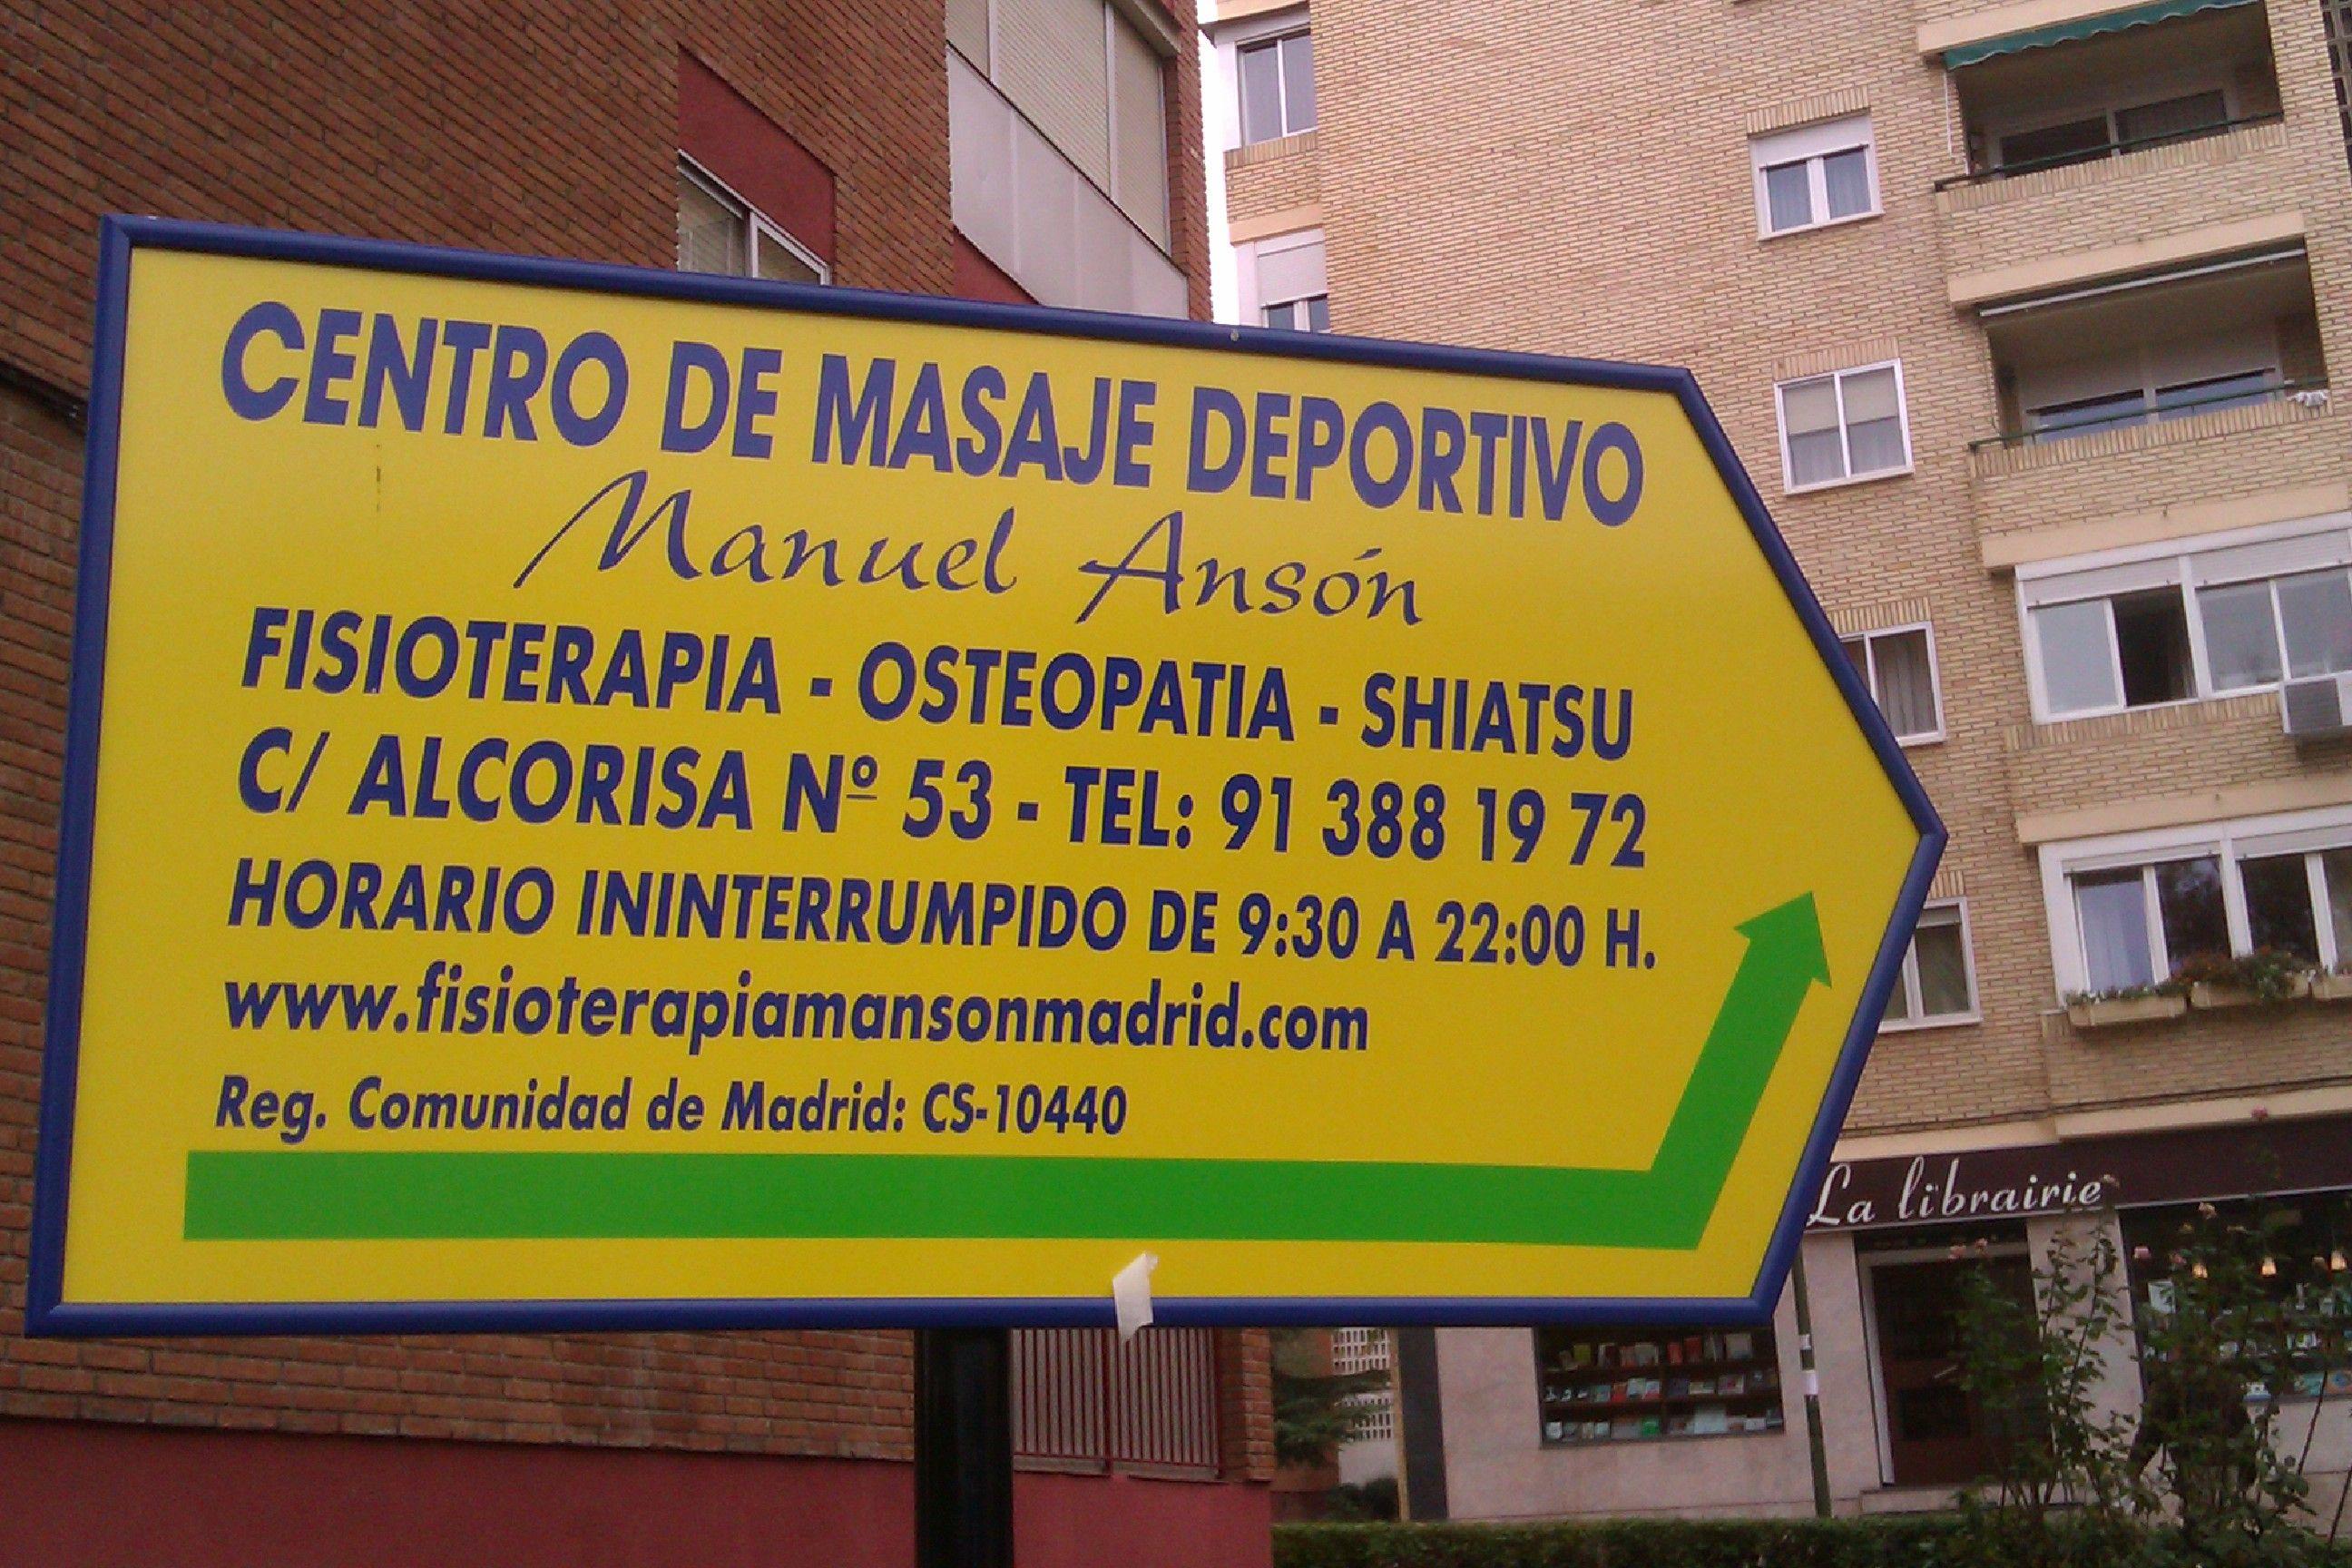 Foto 7 de Fisioterapia en Madrid | Ansón Manuel